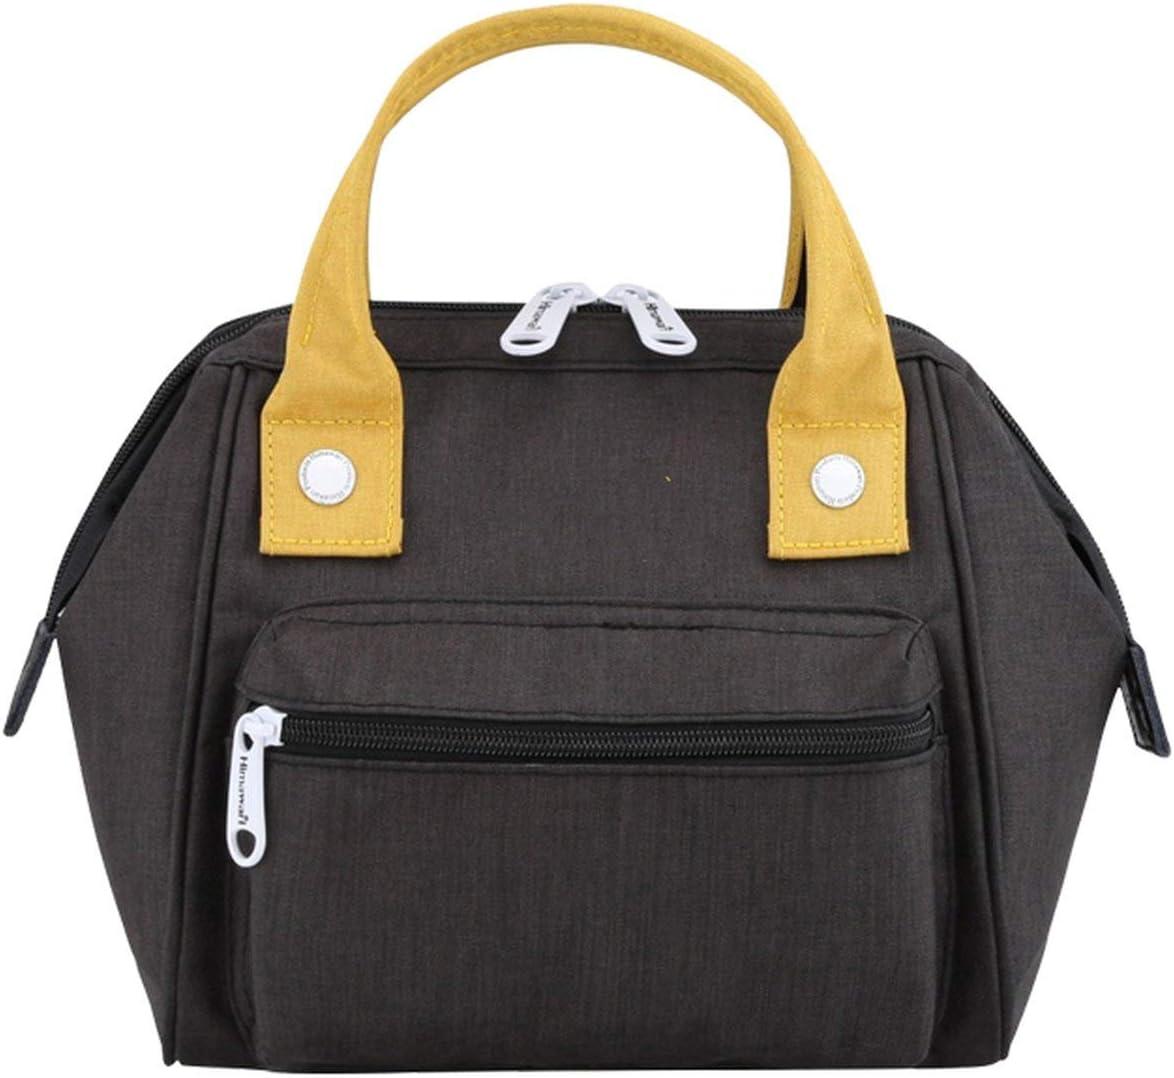 Dai Yao Handbag Messenger Shoulder Bag Women Handbag Fashion Crossbody Bag Casual Female Waterproof SchoolBags,Black